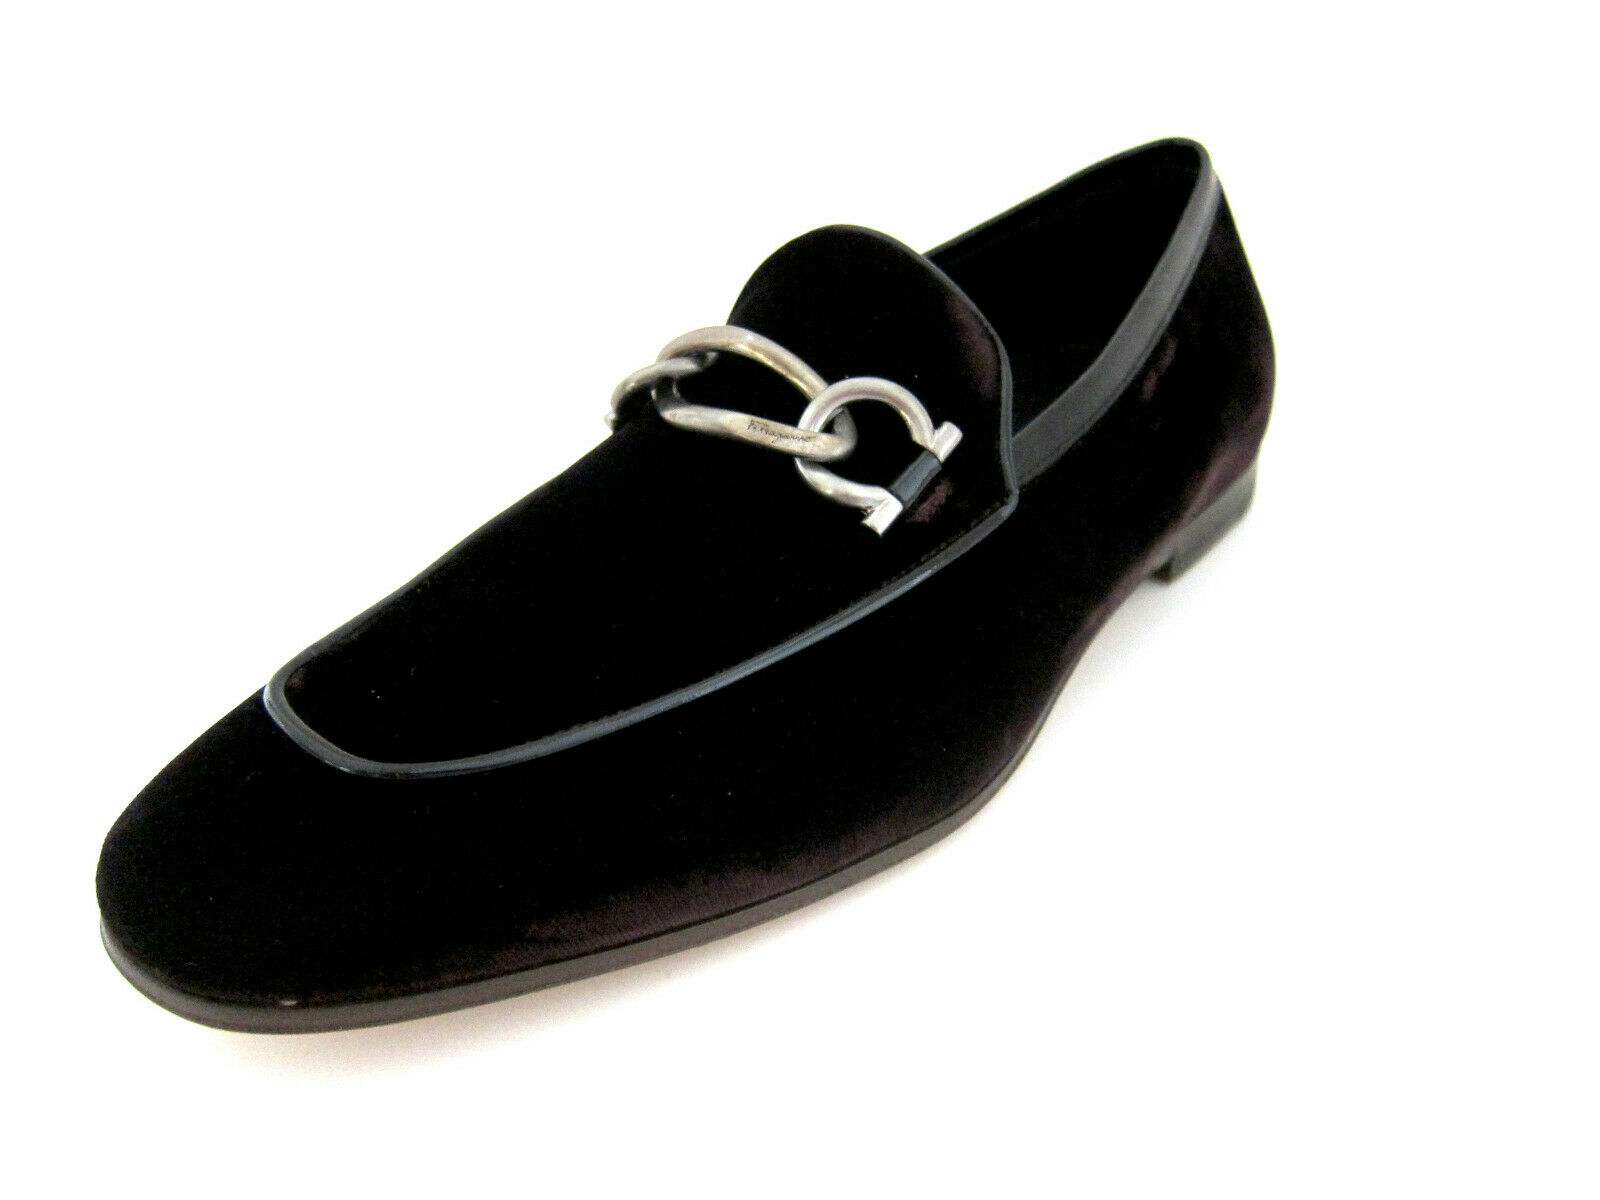 Salvatore Ferragamo Boy 2 mens wine Samt Slippers Schuhe 8.5 E US made in